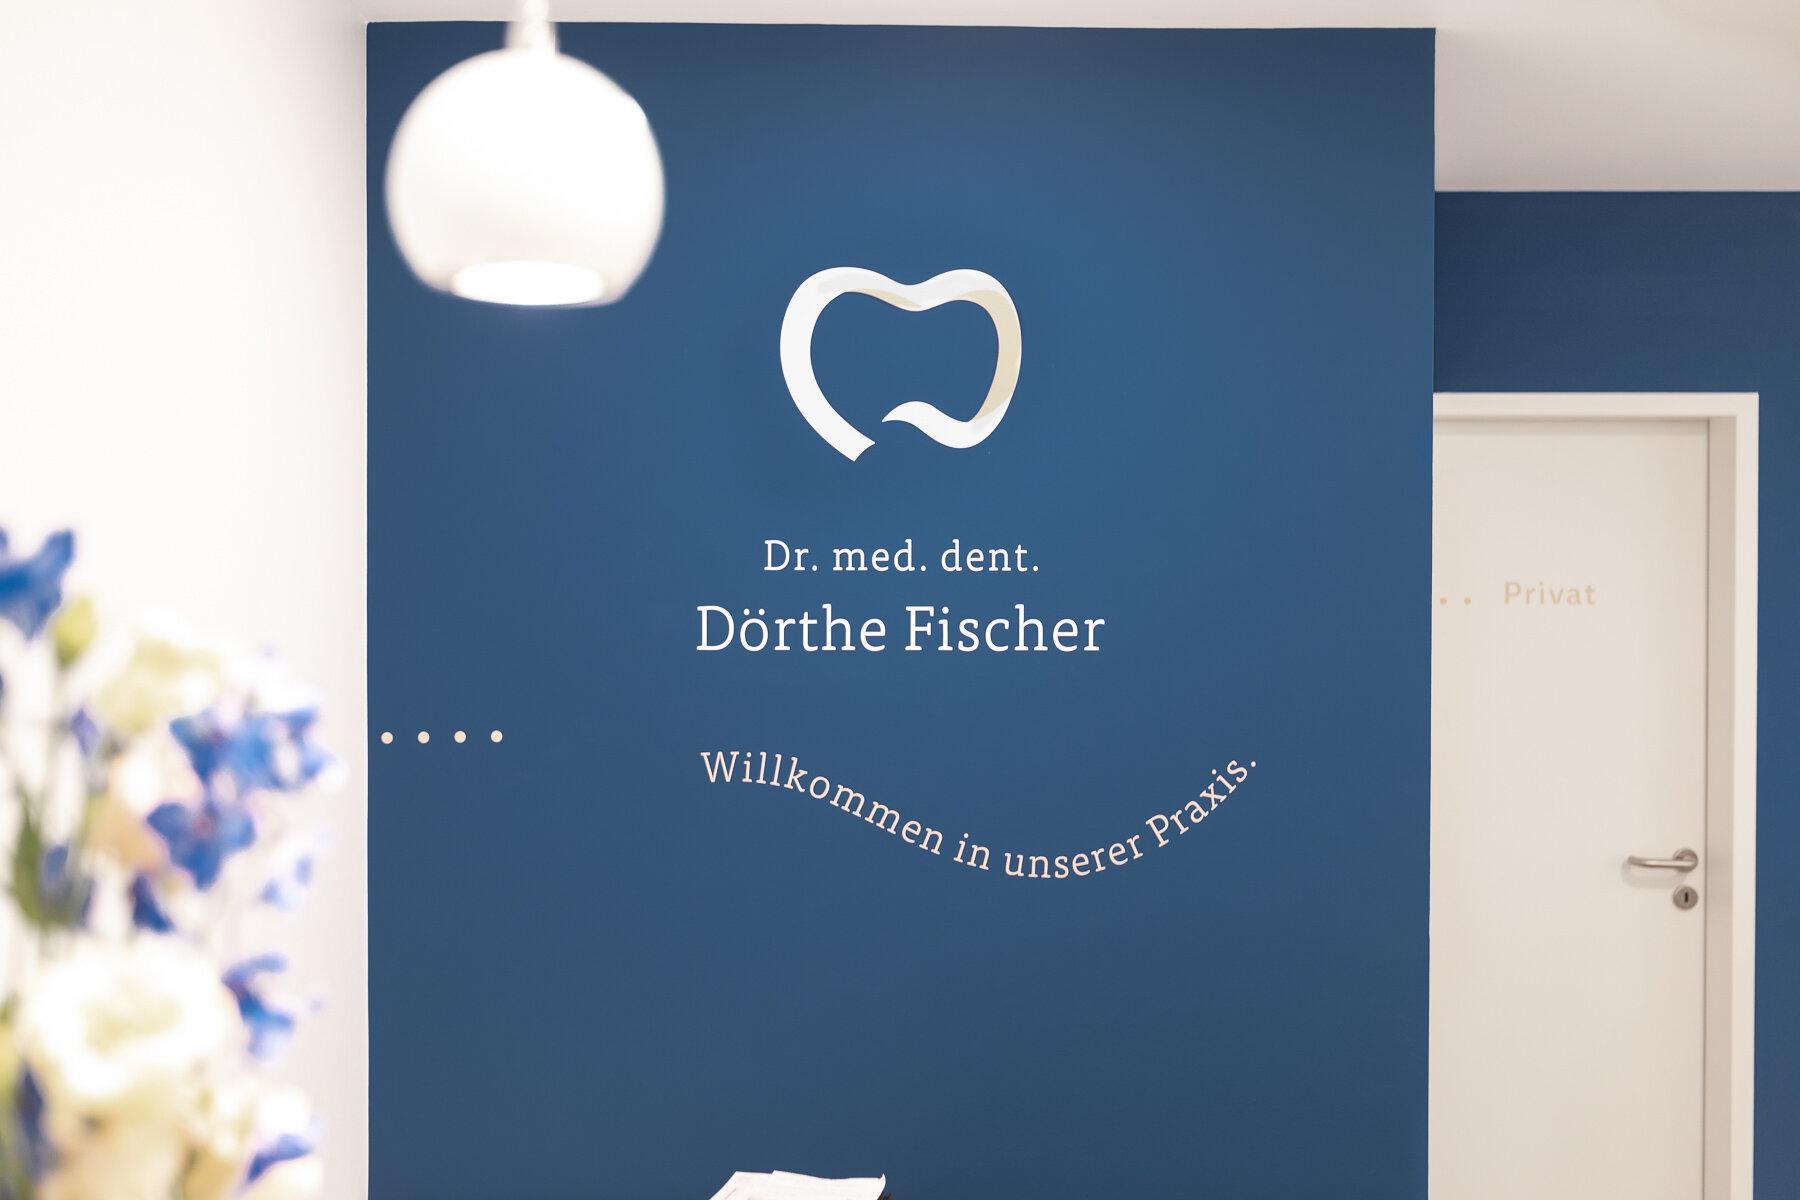 Zahnarzt-Praxis-Doerthe-Fischer-Wuerzburg-modern-identity-design--1054-2.jpg